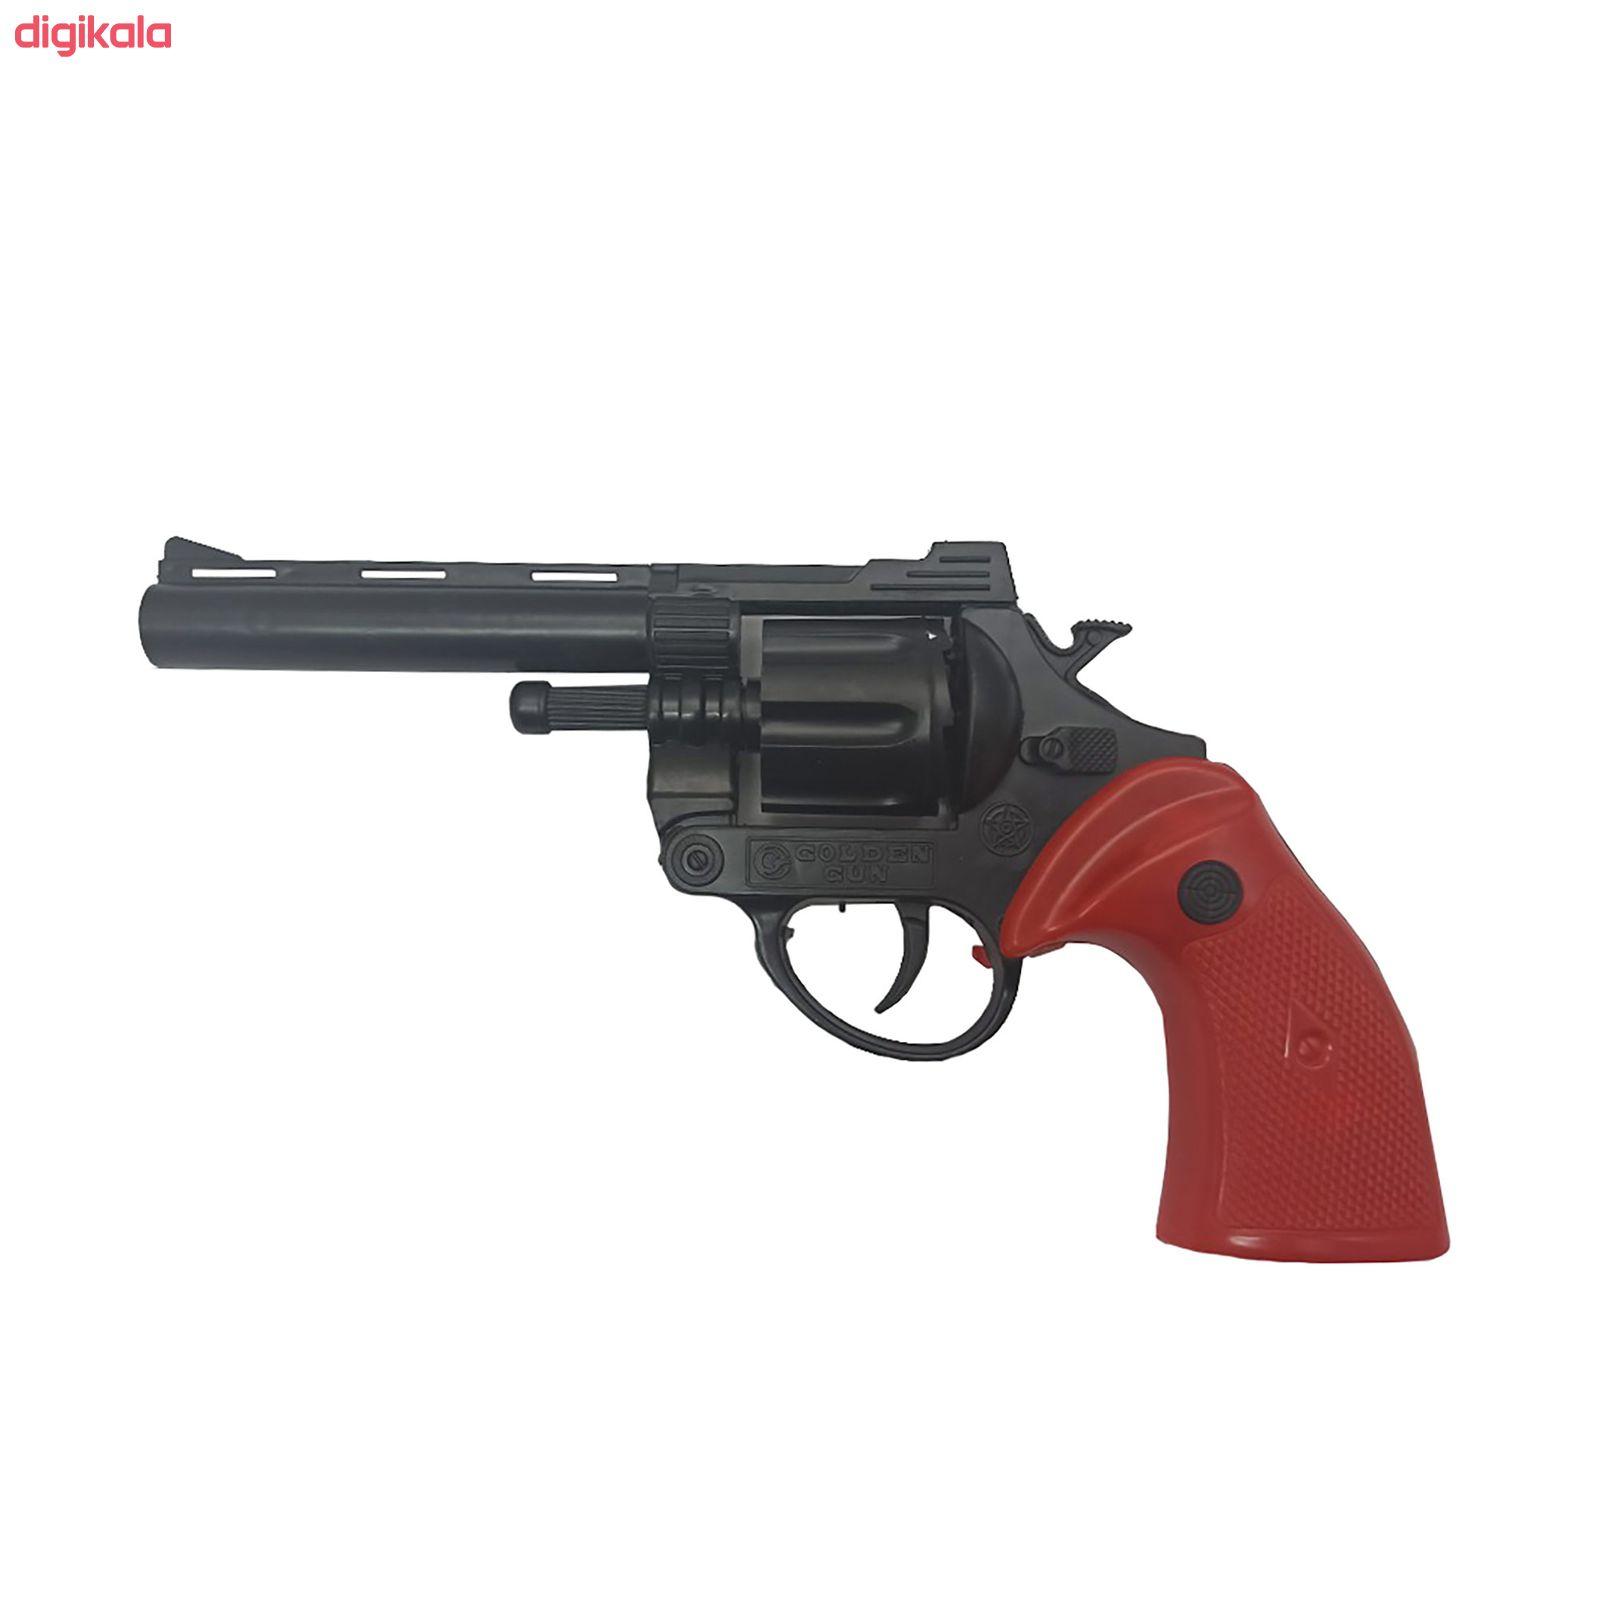 تفنگ بازی گلدن گان مدل naabsell-p70 مجموعه 3 عددی main 1 4